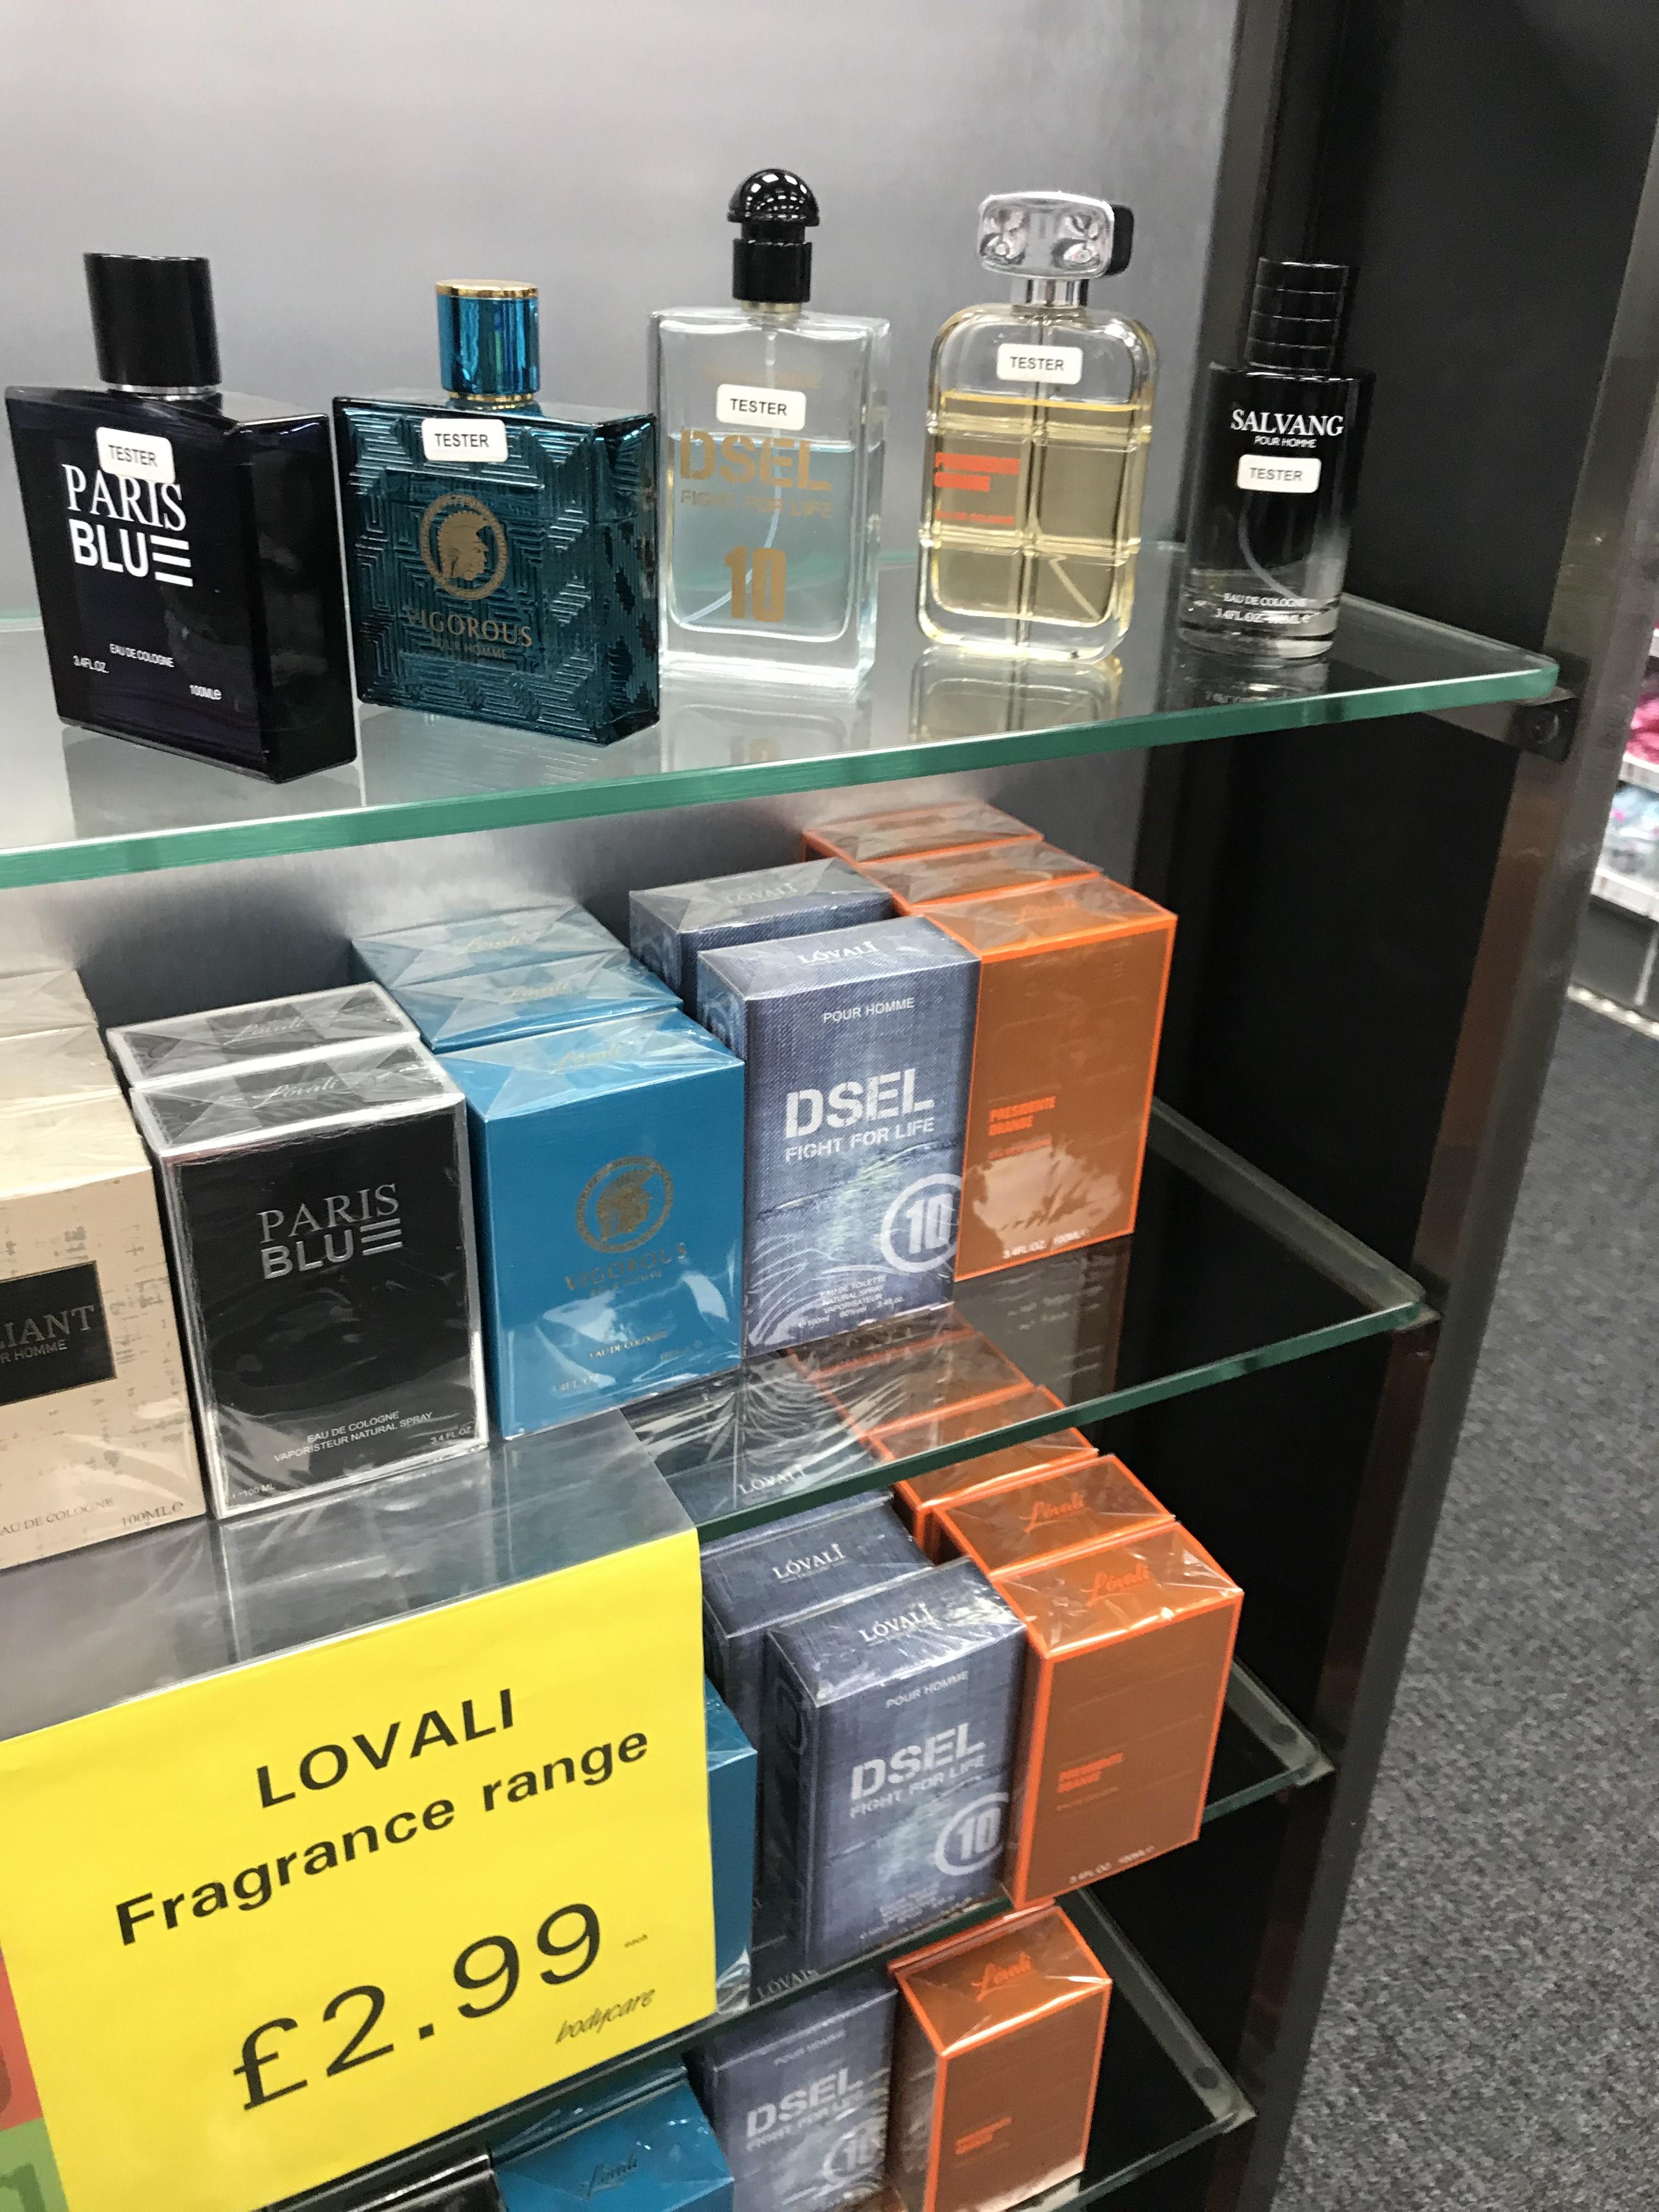 Cheap copies of perfumes in Bodycare - £2.99 [Dsel / Salvang / Vigorous + more]